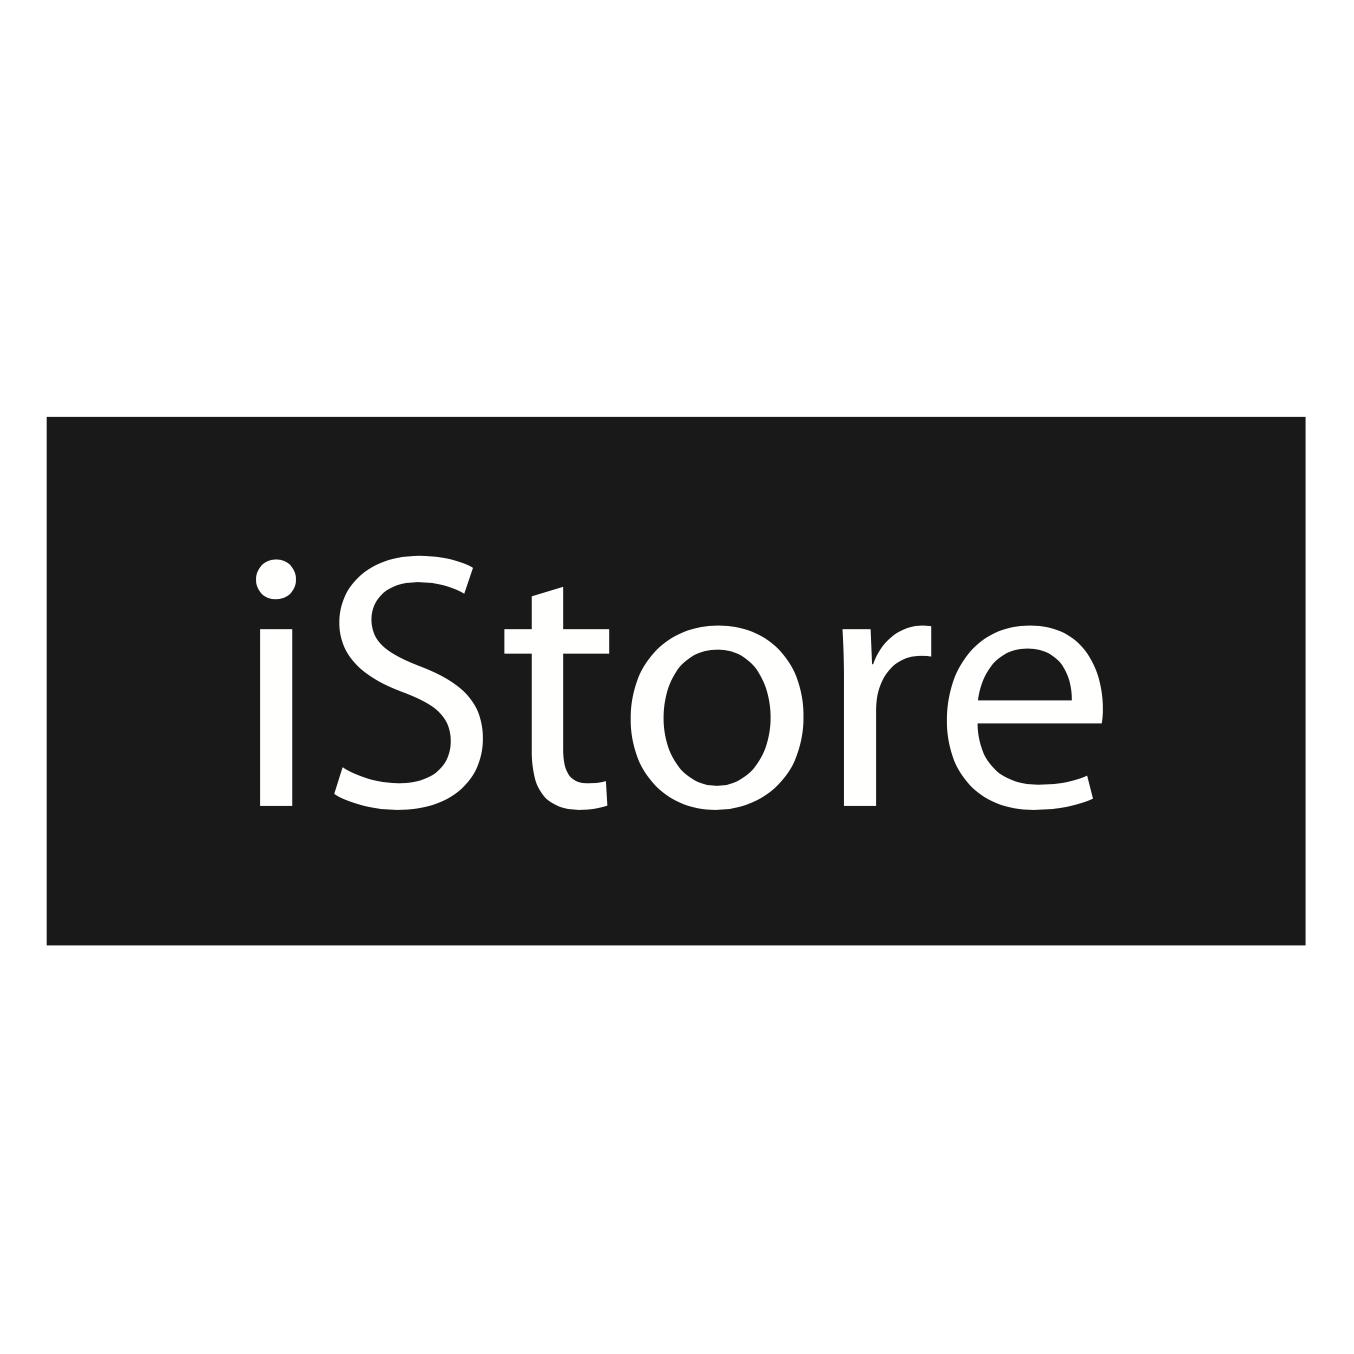 USB-C Hub for iPad Pro - Space Grey